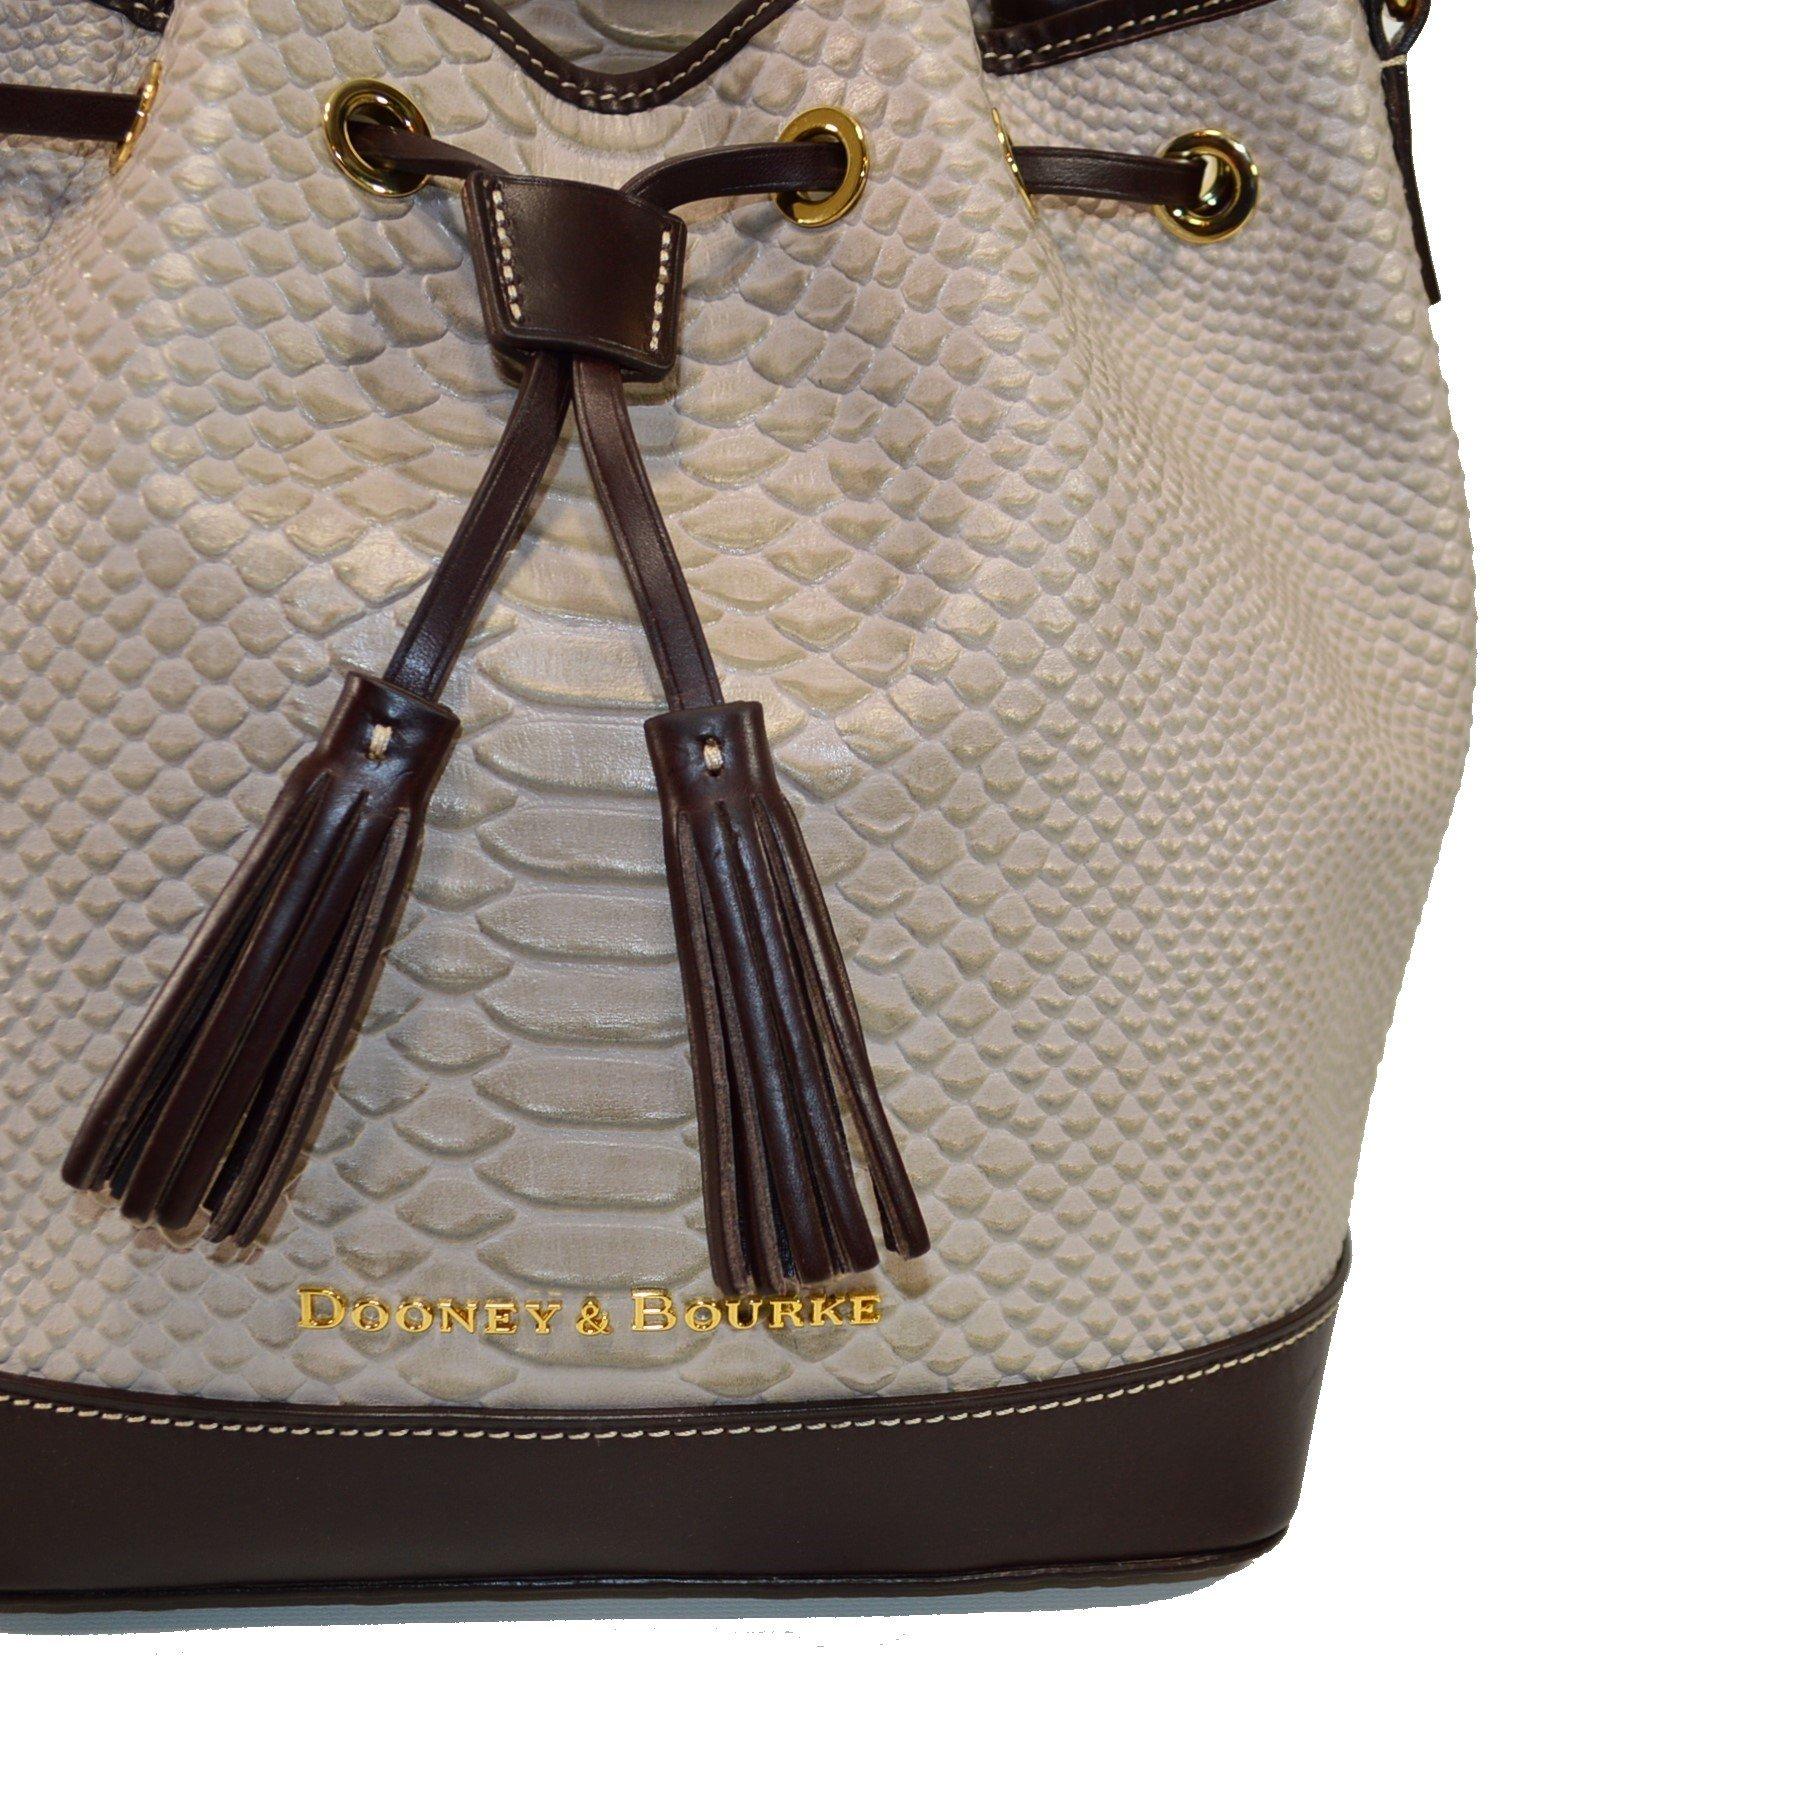 Dooney & Bourke Cordova Leather Drawstring Bag BCALD9038 Taupe by Dooney & Bourke (Image #1)